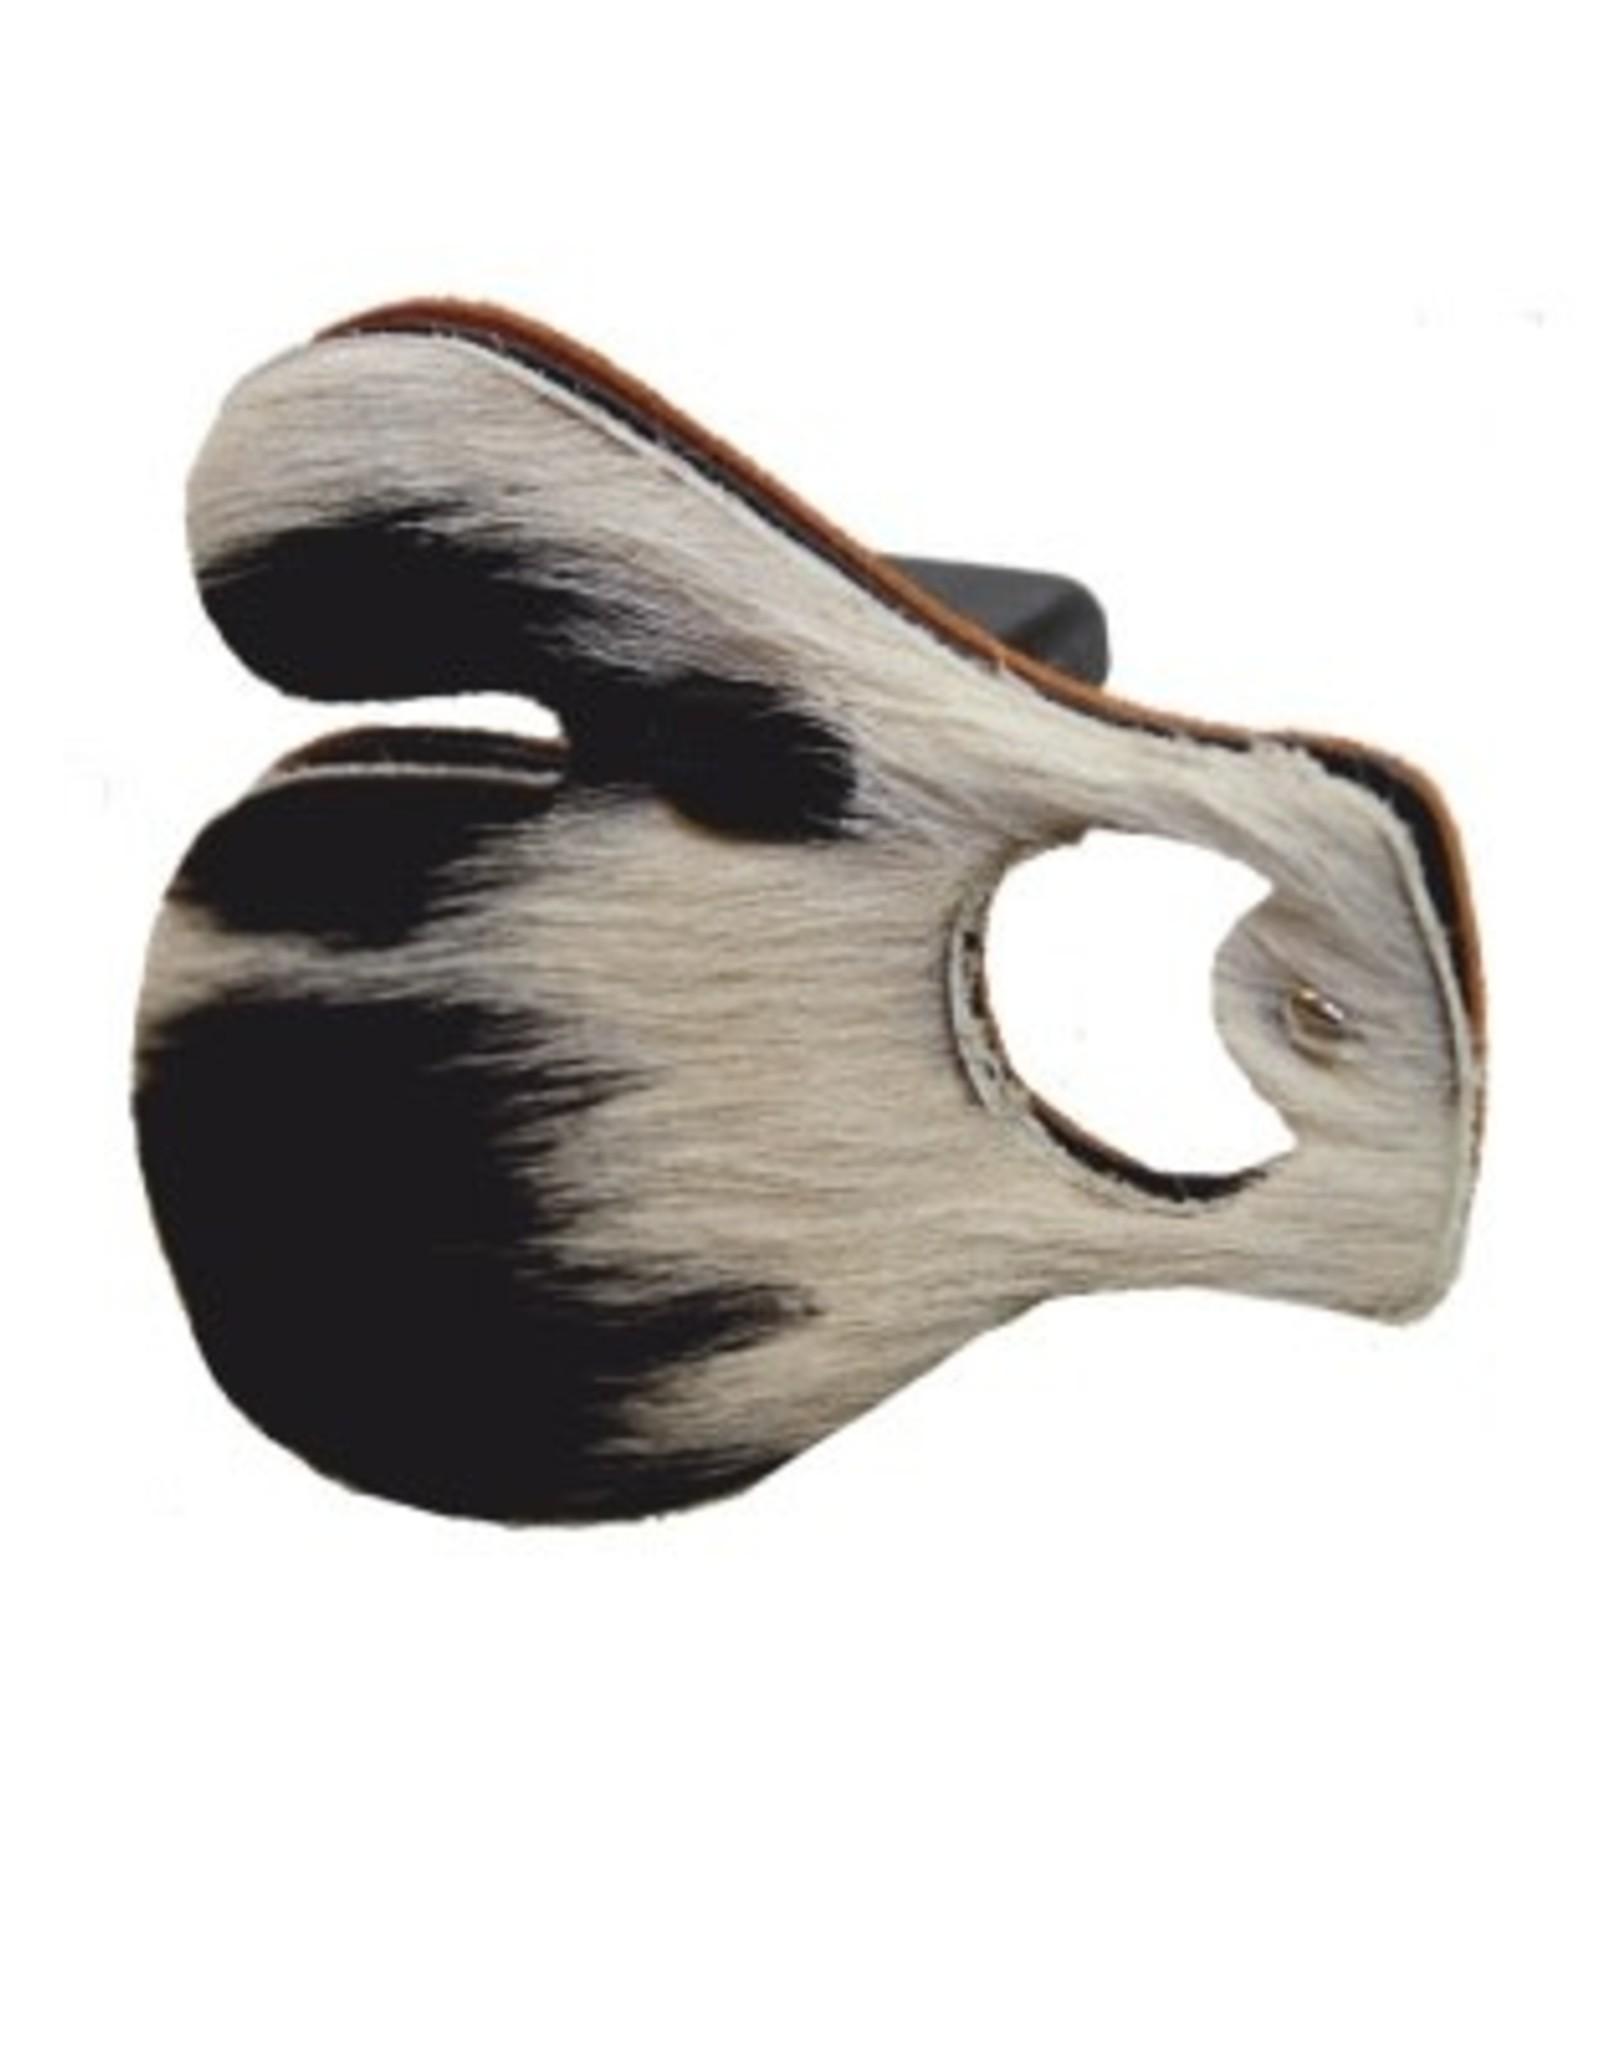 Greatree Archery Farmington Archery Hair Tab